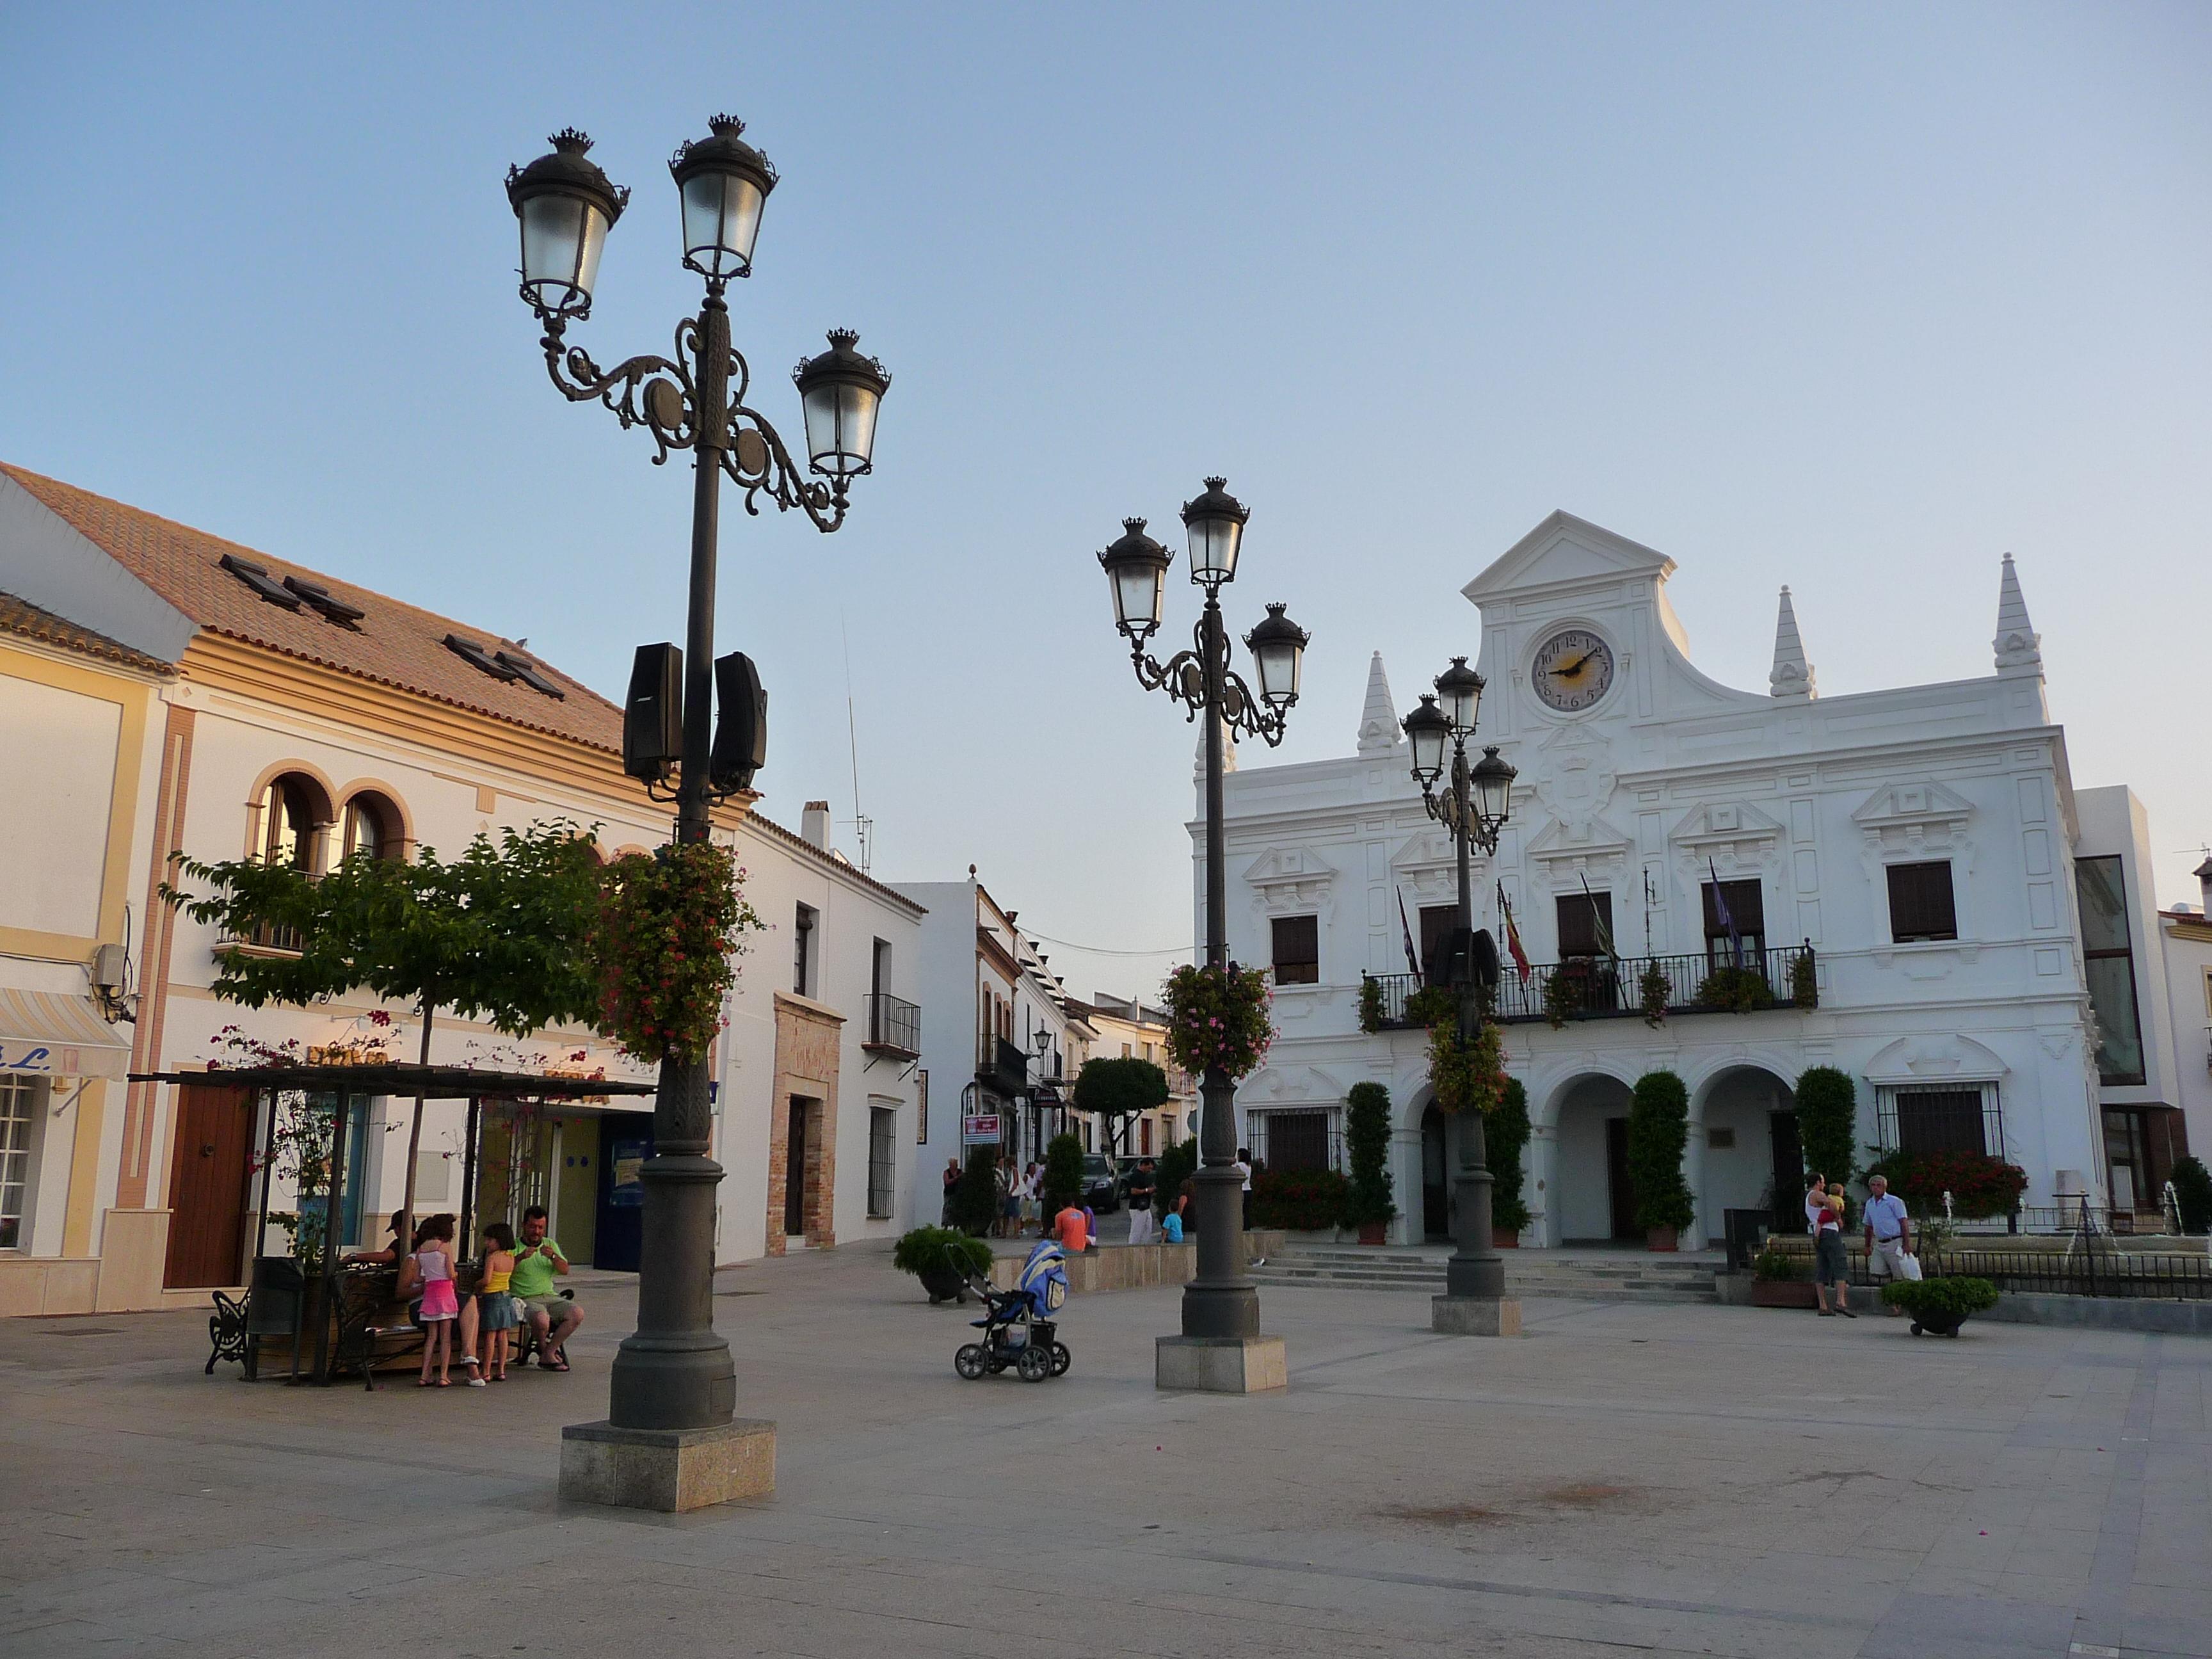 Ficheru:Plaza de Cartaya 01.JPG - Wikipedia